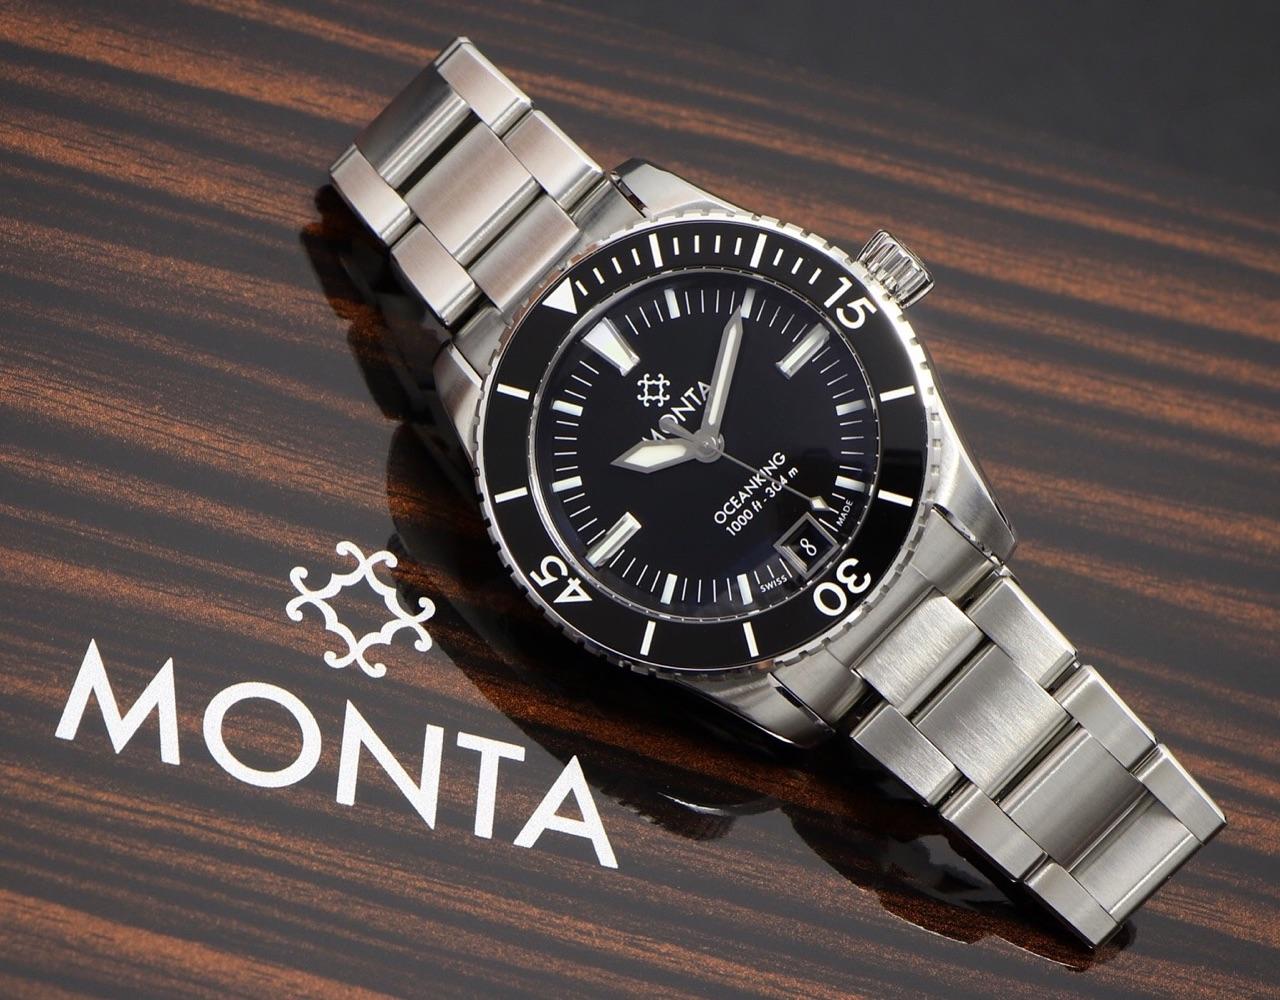 Introducing monta oceanking dive watch with eterna - Oceanic dive watch ...